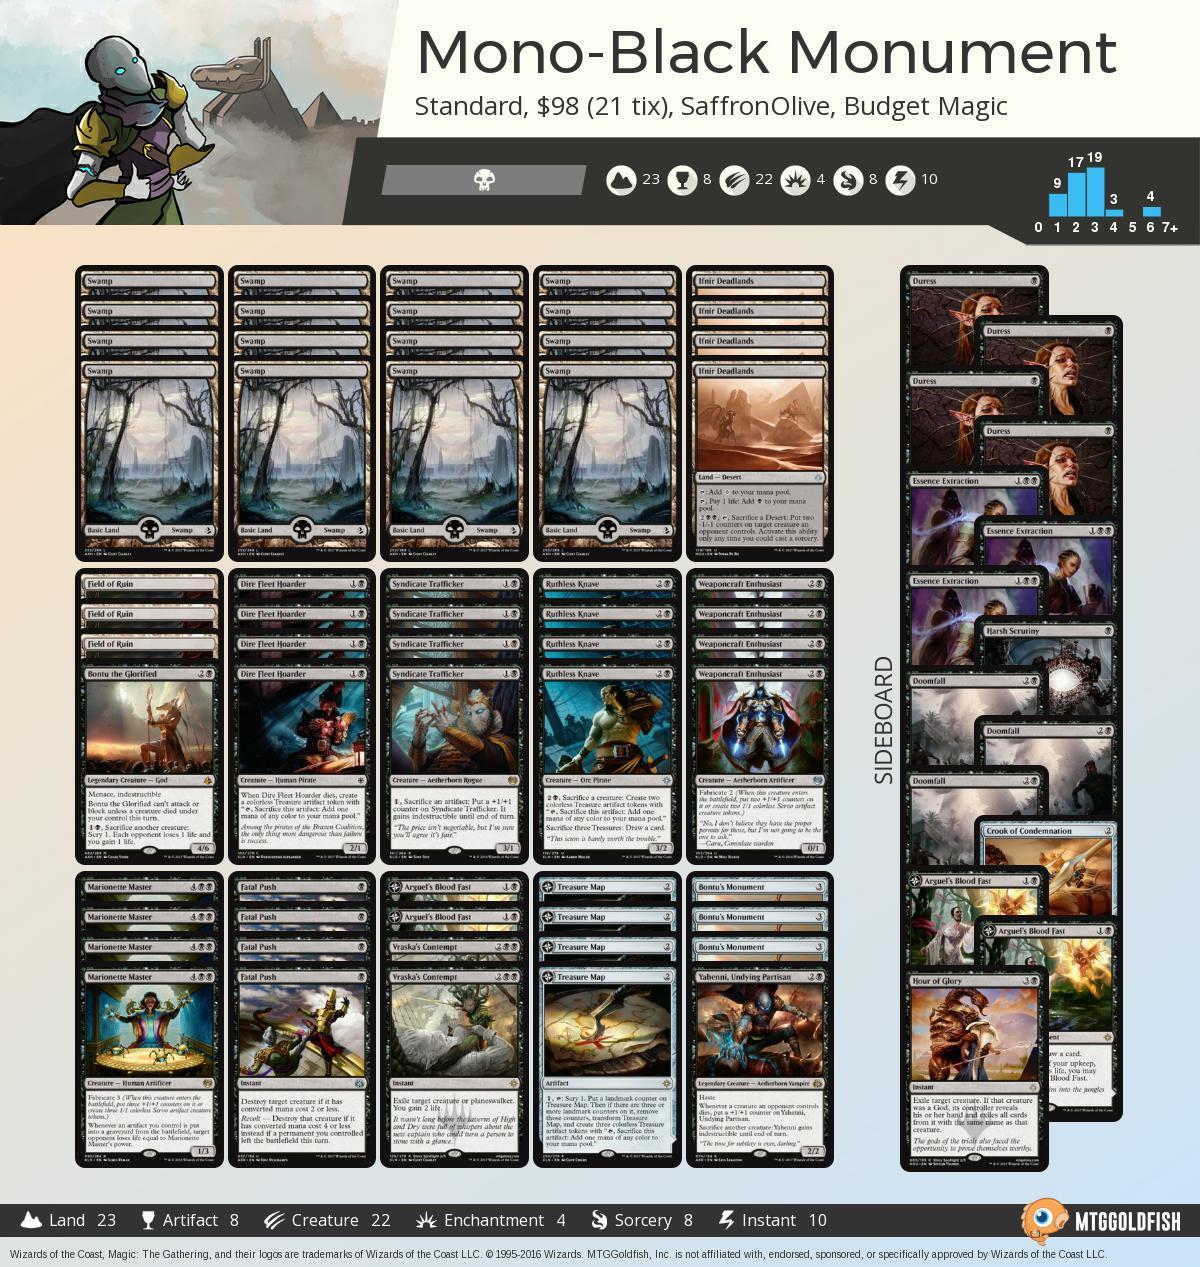 Mono black%2bmonument b11affb6 f71f 4c31 b7d2 5e2f8969f950%2ejpg